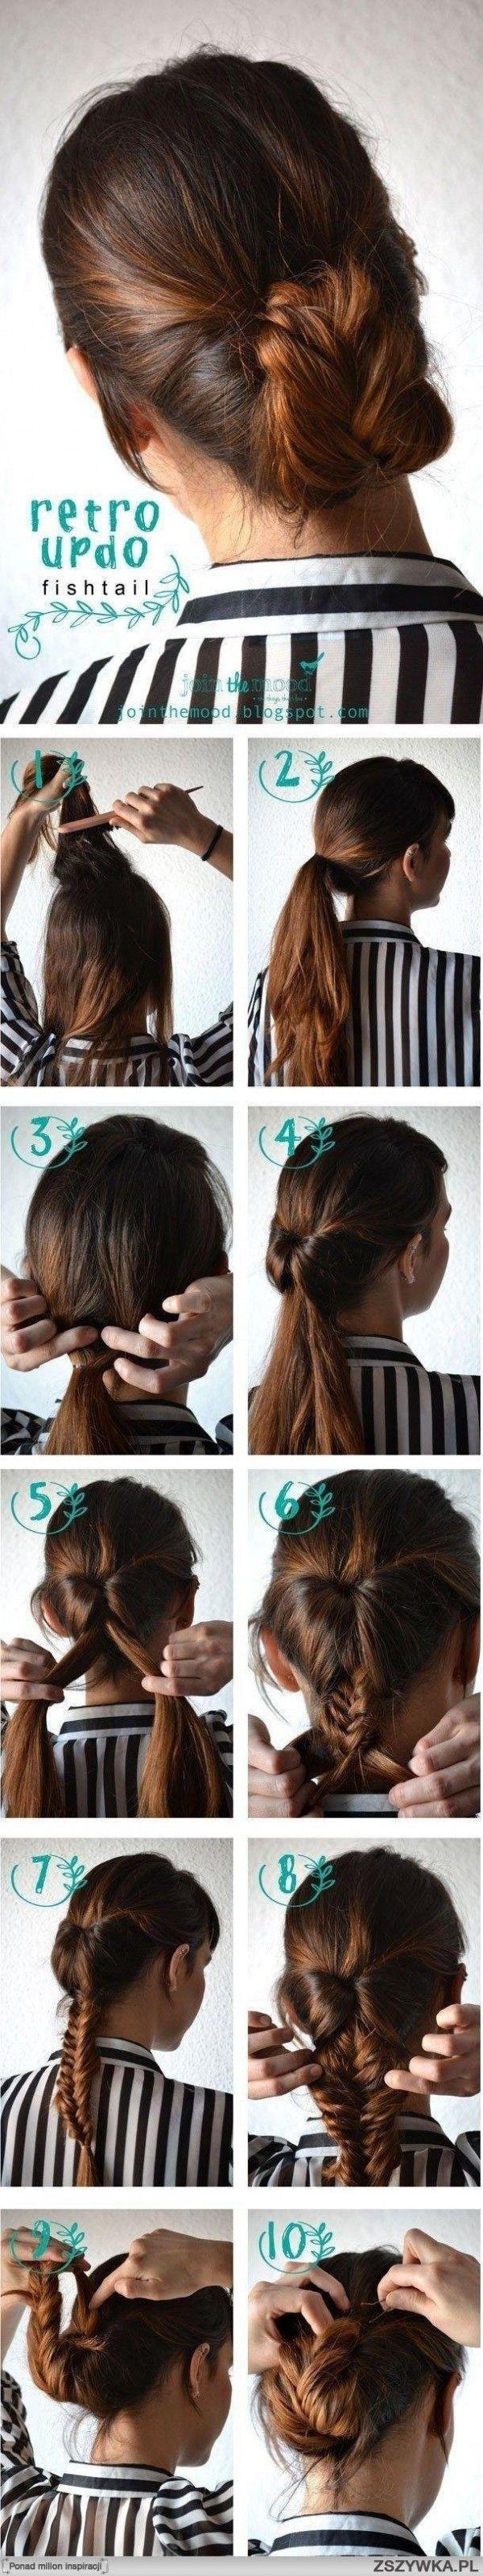 Fancy updo hairstyles for medium length hair